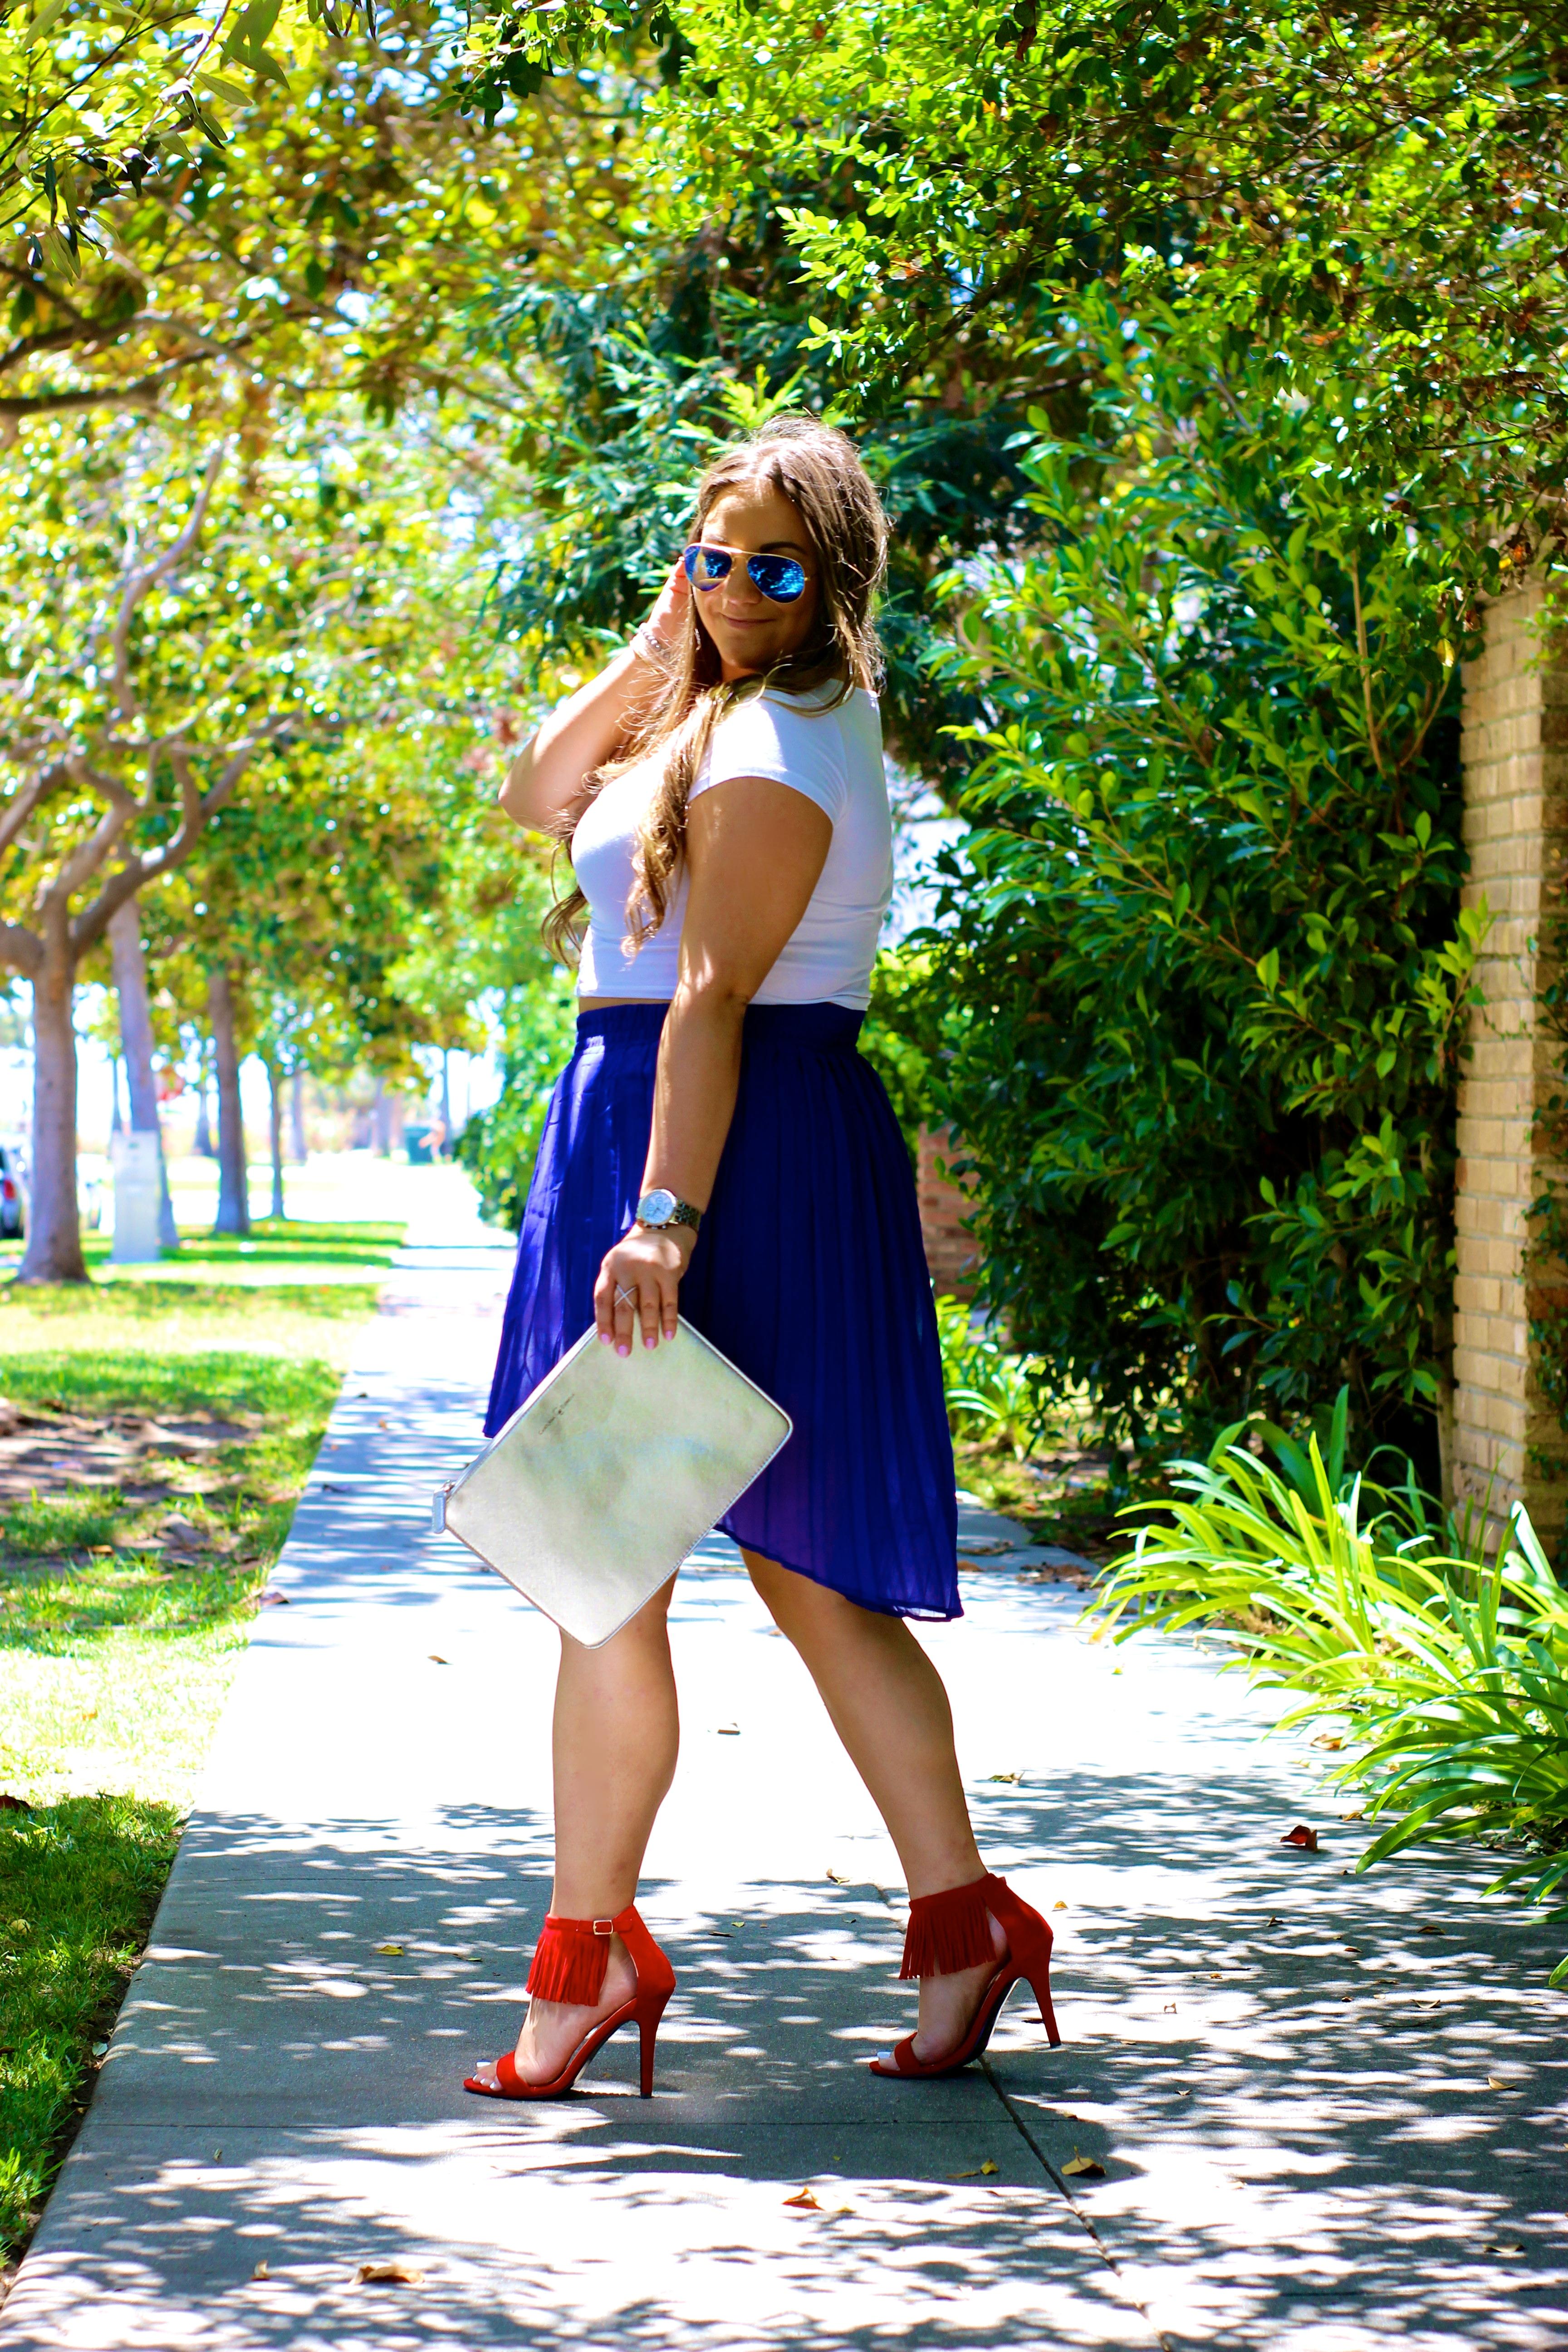 missyonmadison, love shopping miami, blue pleated skirt, blue pleated high low skirt, melissa tierney, fringe heels, red fringe heels, red fringe sandals, metallic silver clutch, silver clutch, ray bans, mirrored aviators, white crop top, metallic clutch, carolinna espinosa clutch, summer style, labor day weekend, labor day style, labor day, santa monica, la blogger, fashion blogger, style blogger,